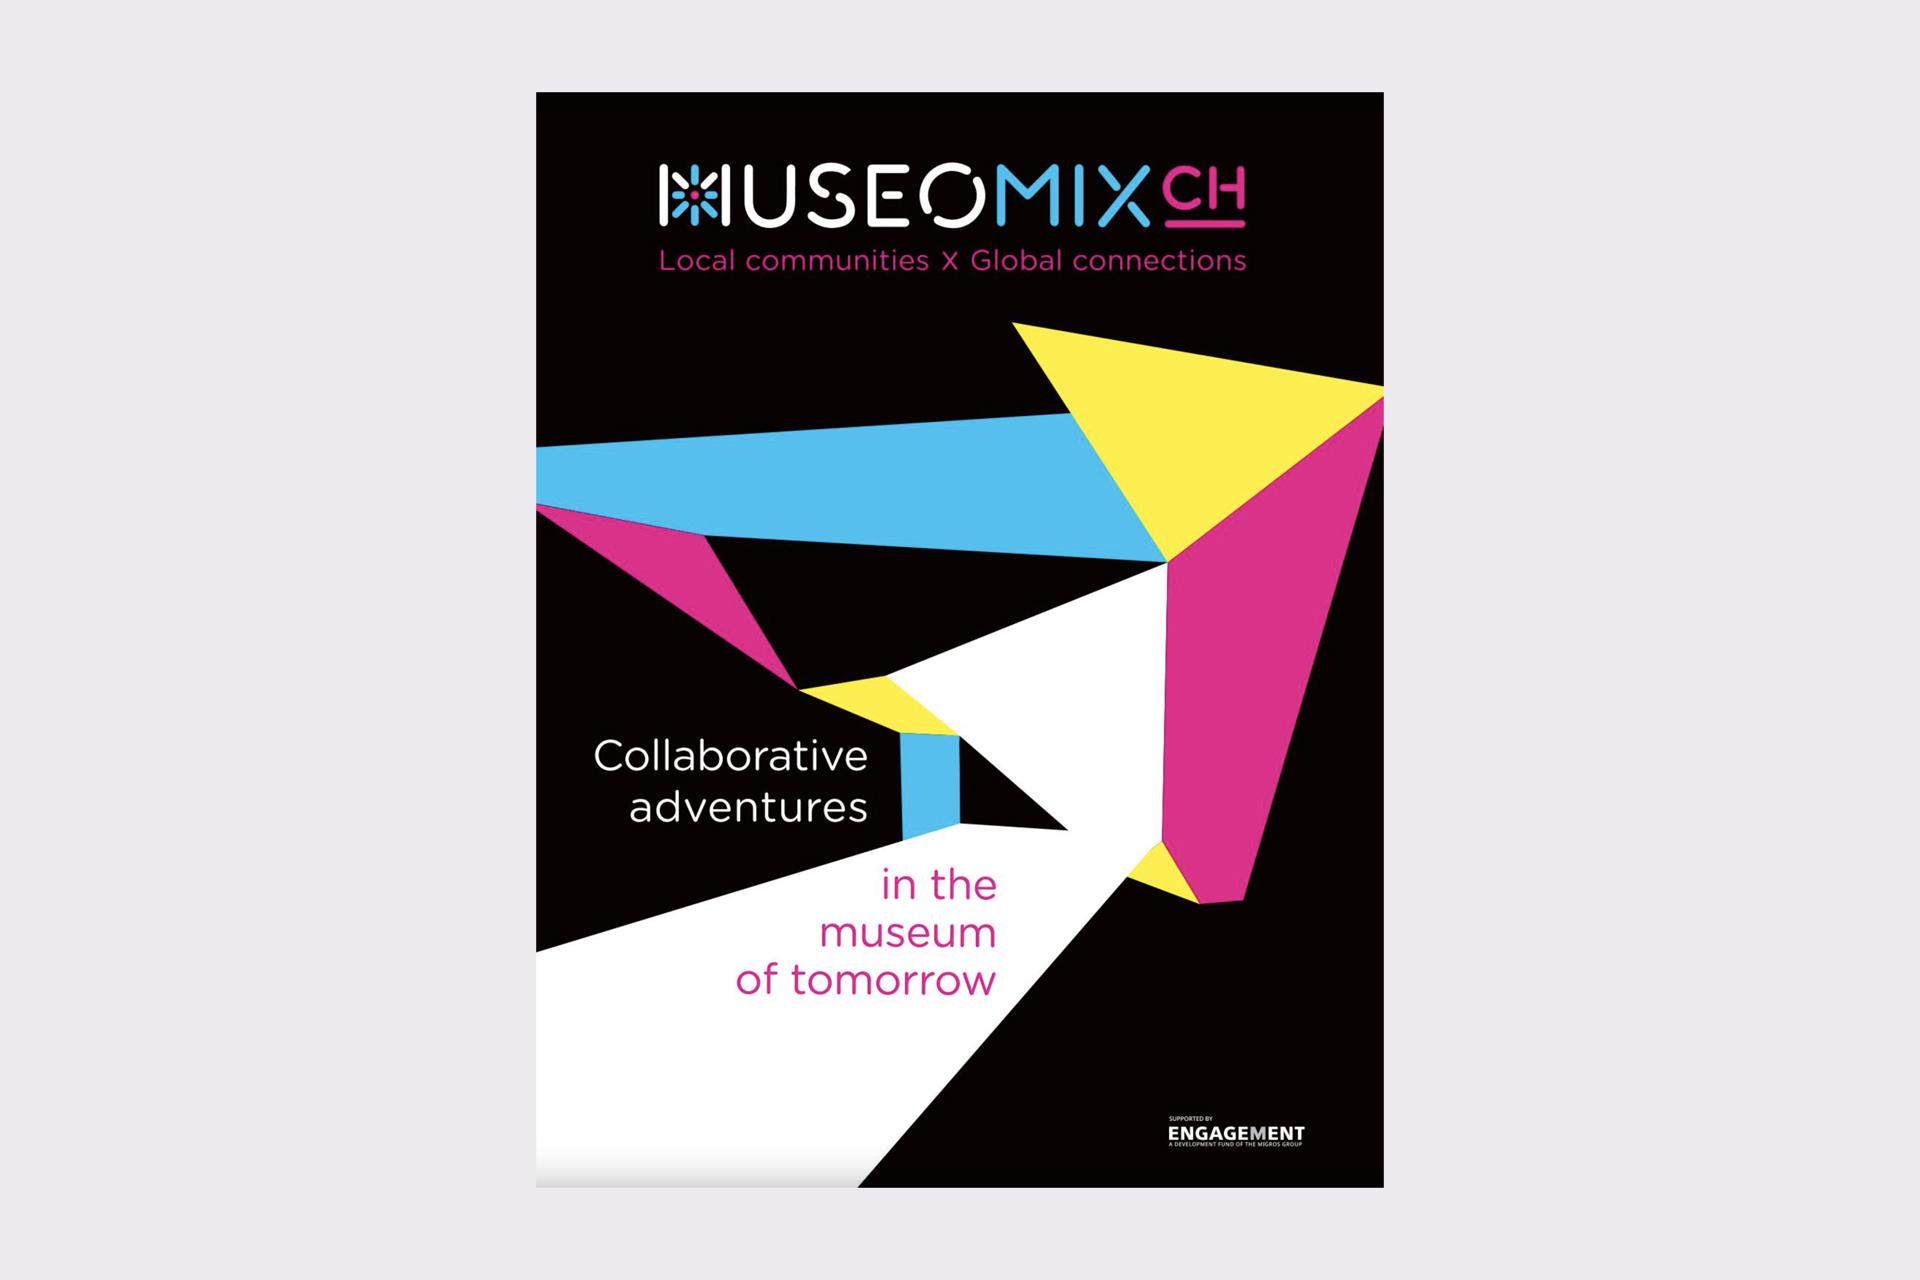 édition Museomix